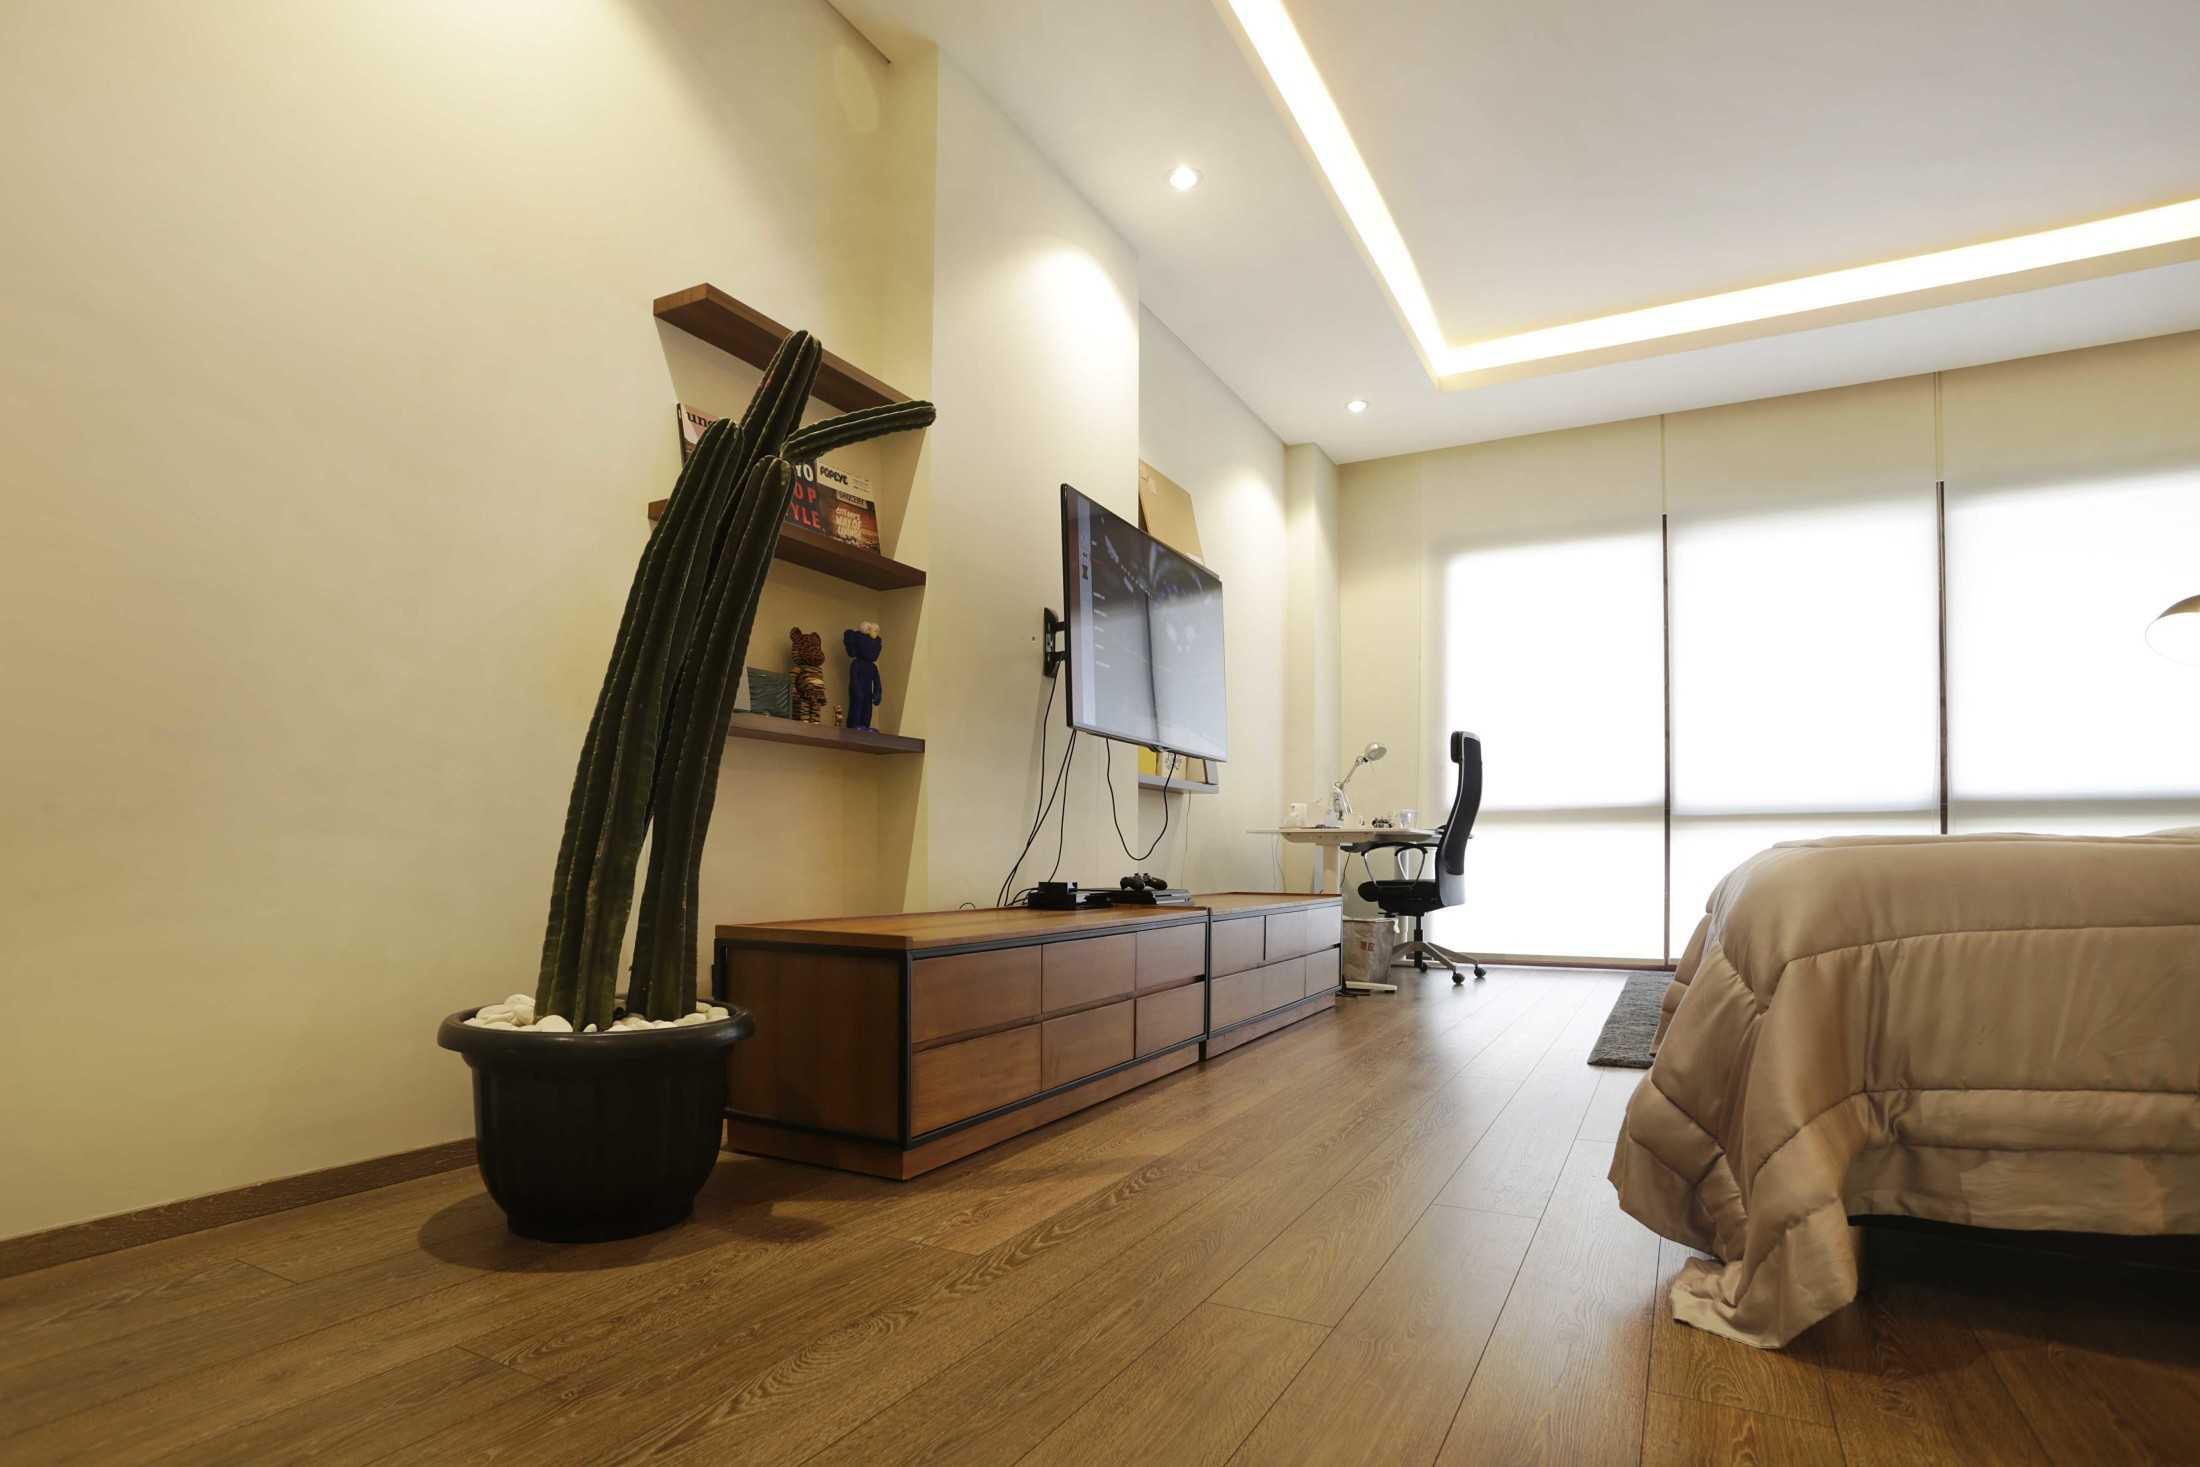 Jasa Interior Desainer Home by Fabelio.com di Jakarta Barat